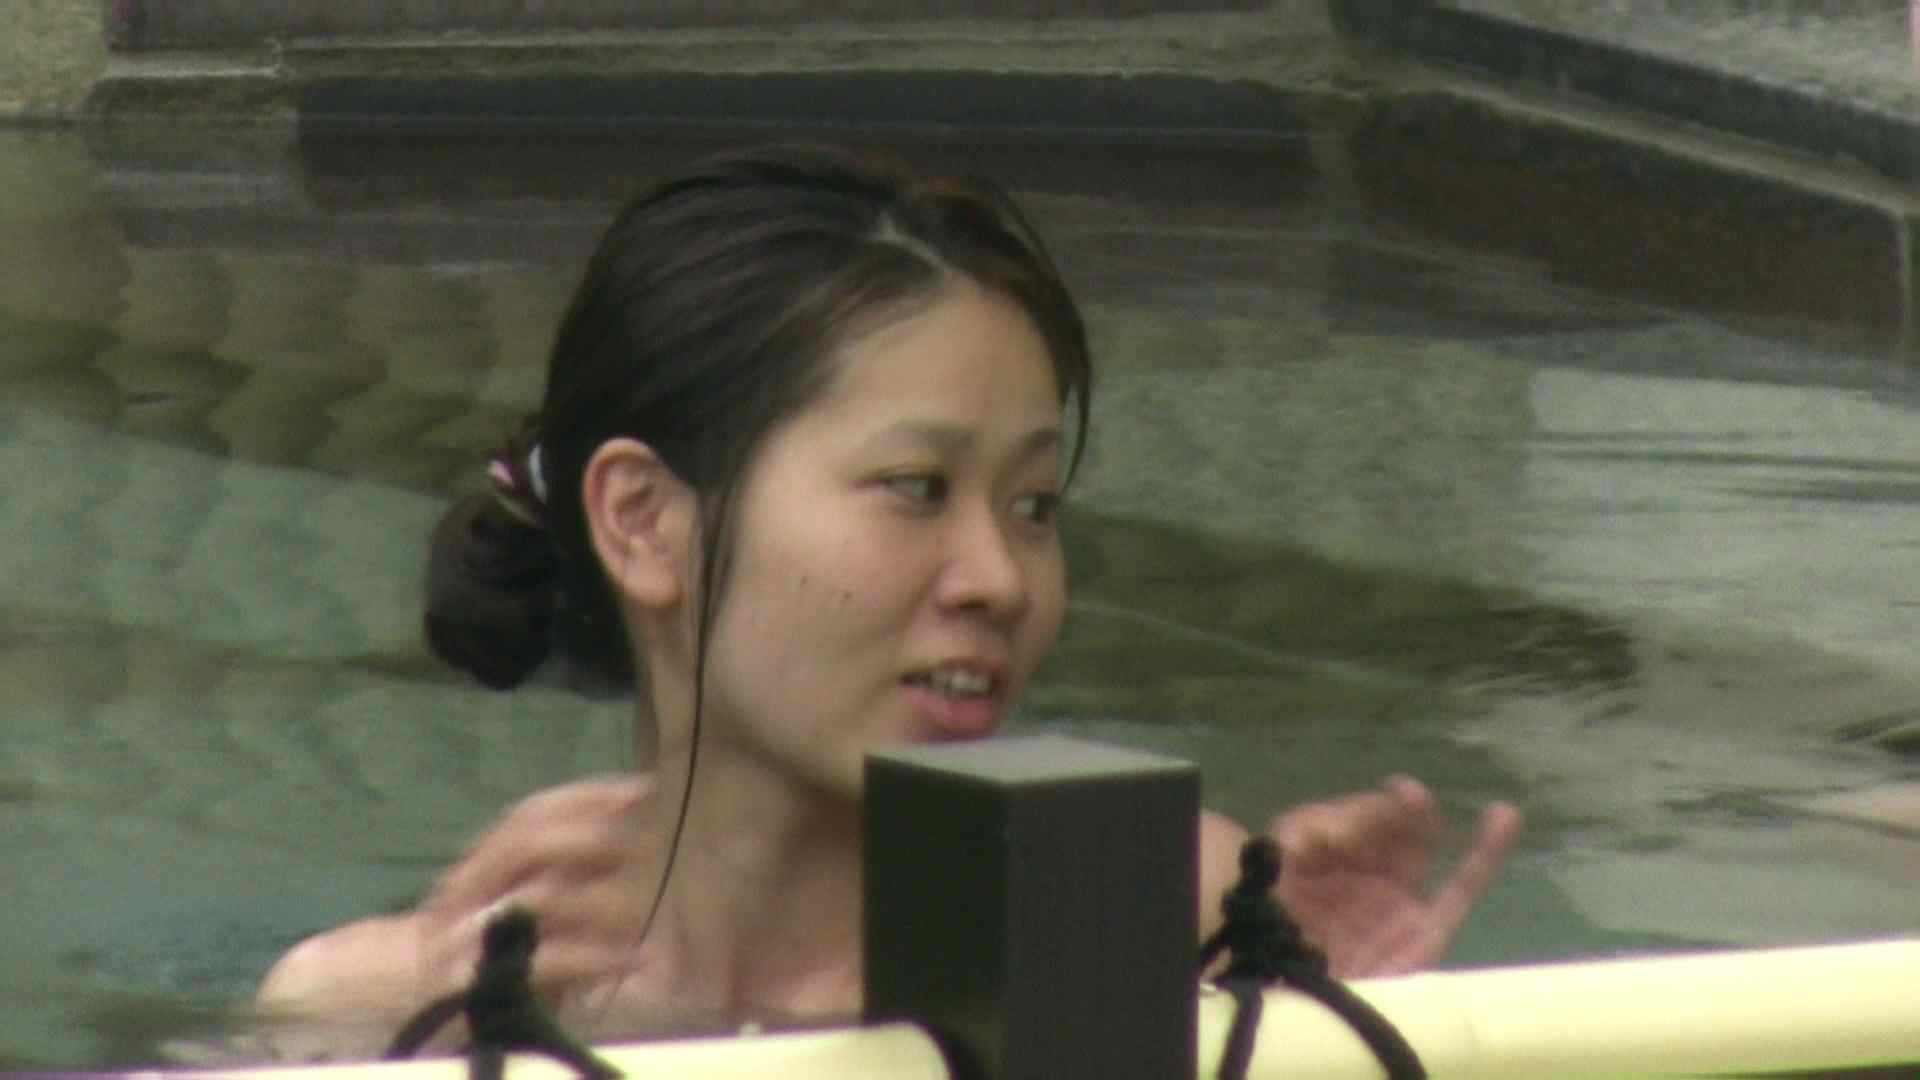 Aquaな露天風呂Vol.07 露天風呂 エロ無料画像 111連発 44